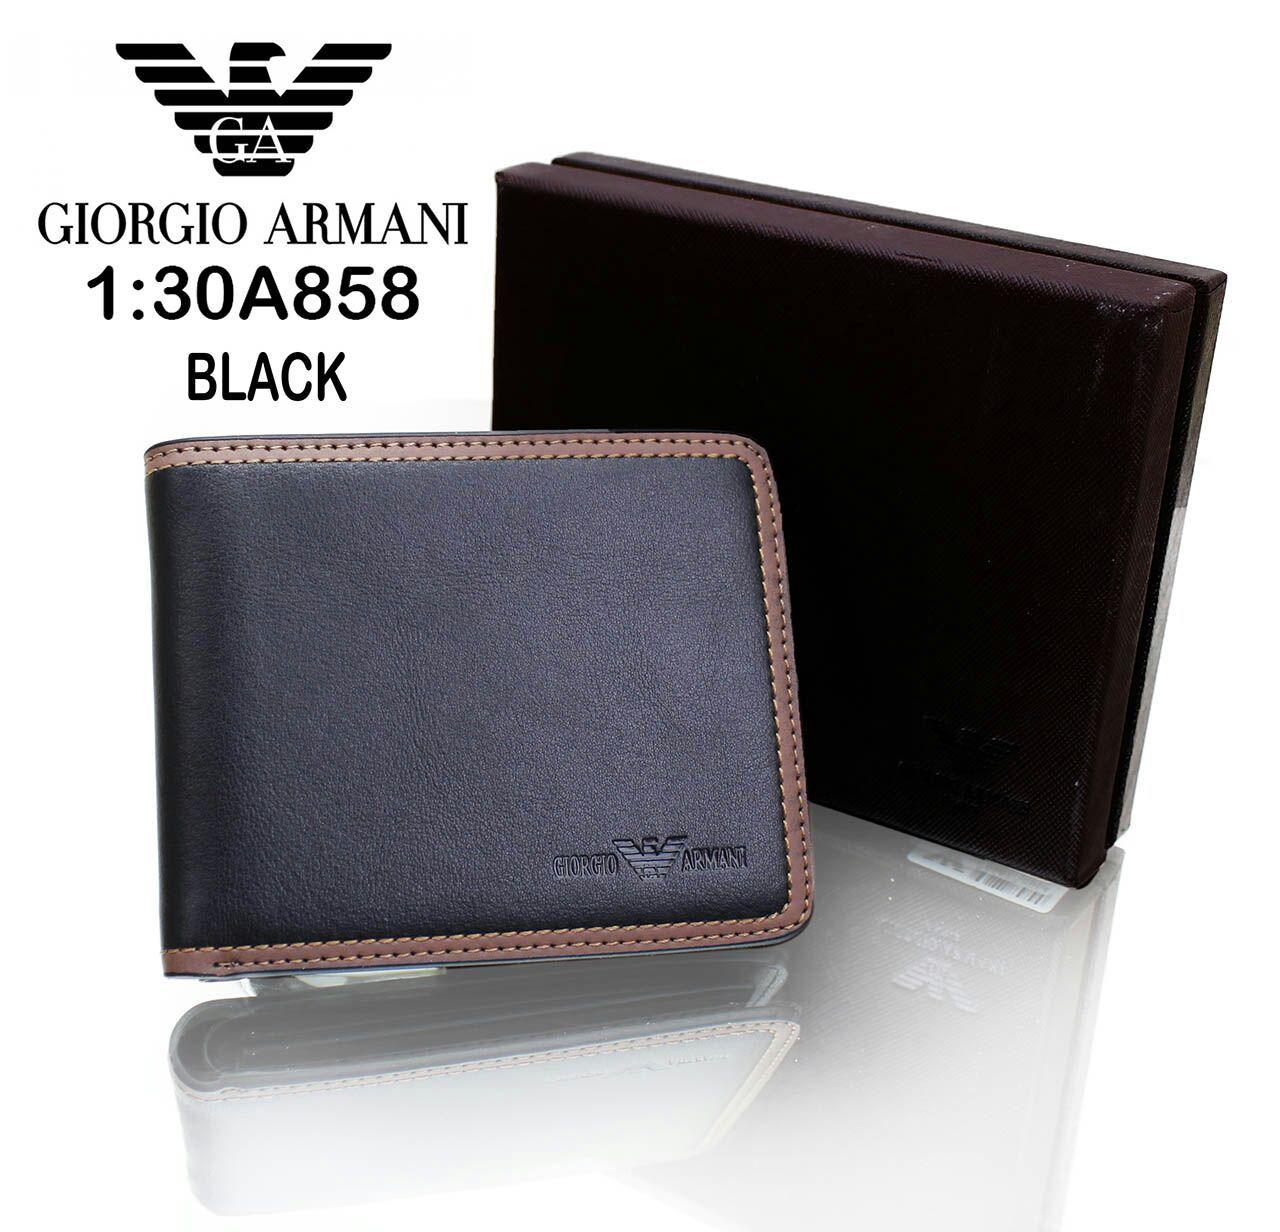 Jual Dompet Pria Branded Giorgio Armani Model Terbaru 0821 7412 1717 Kulit Fashion Elegan Import Wa Http